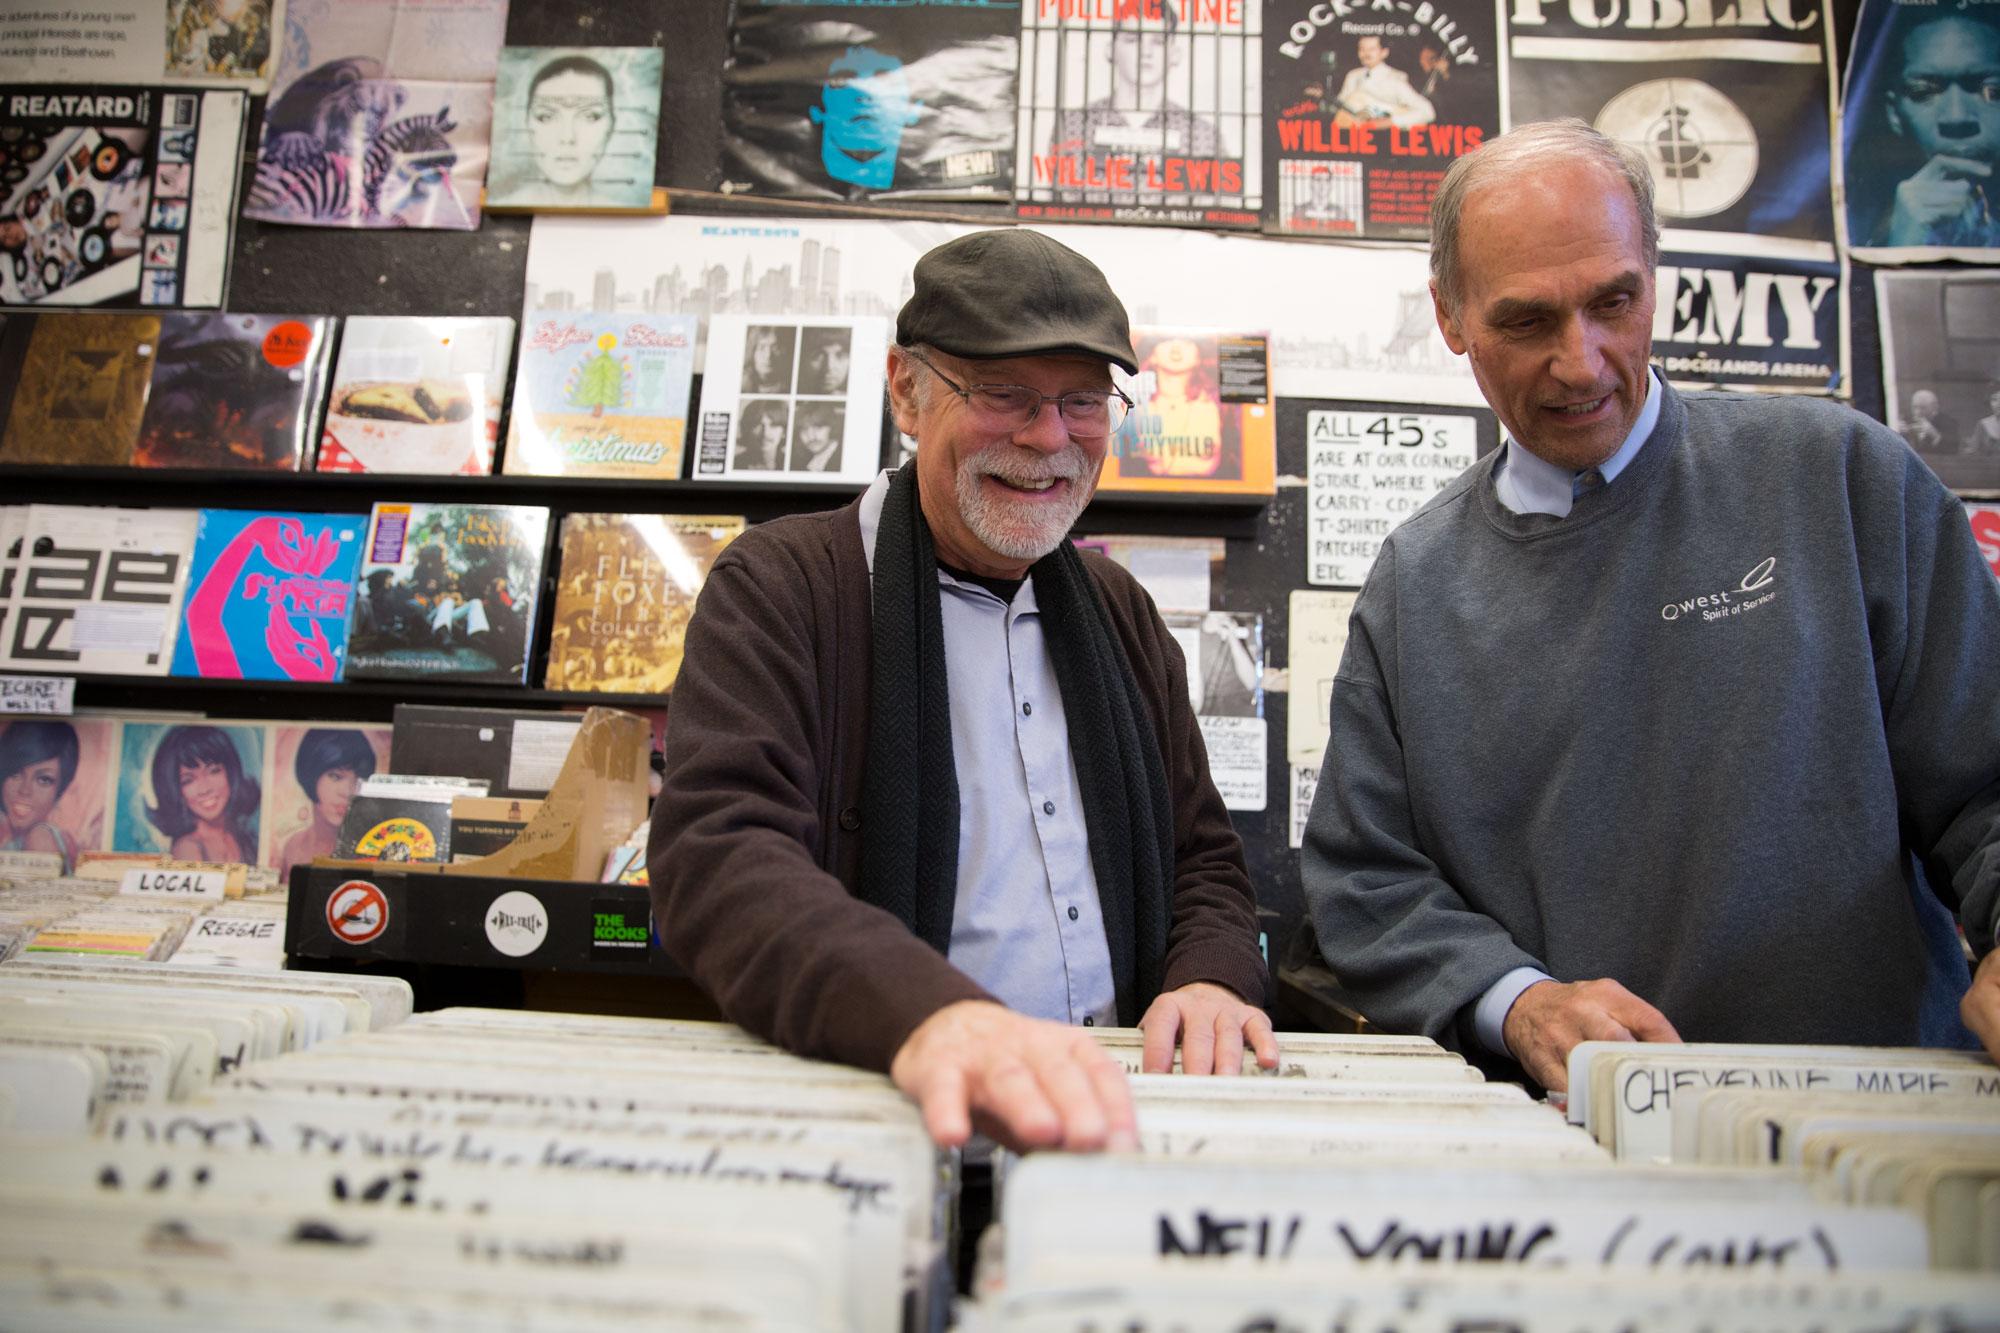 Photo: Wax Trax Records 1 | Duane Davis and Dave Stidman